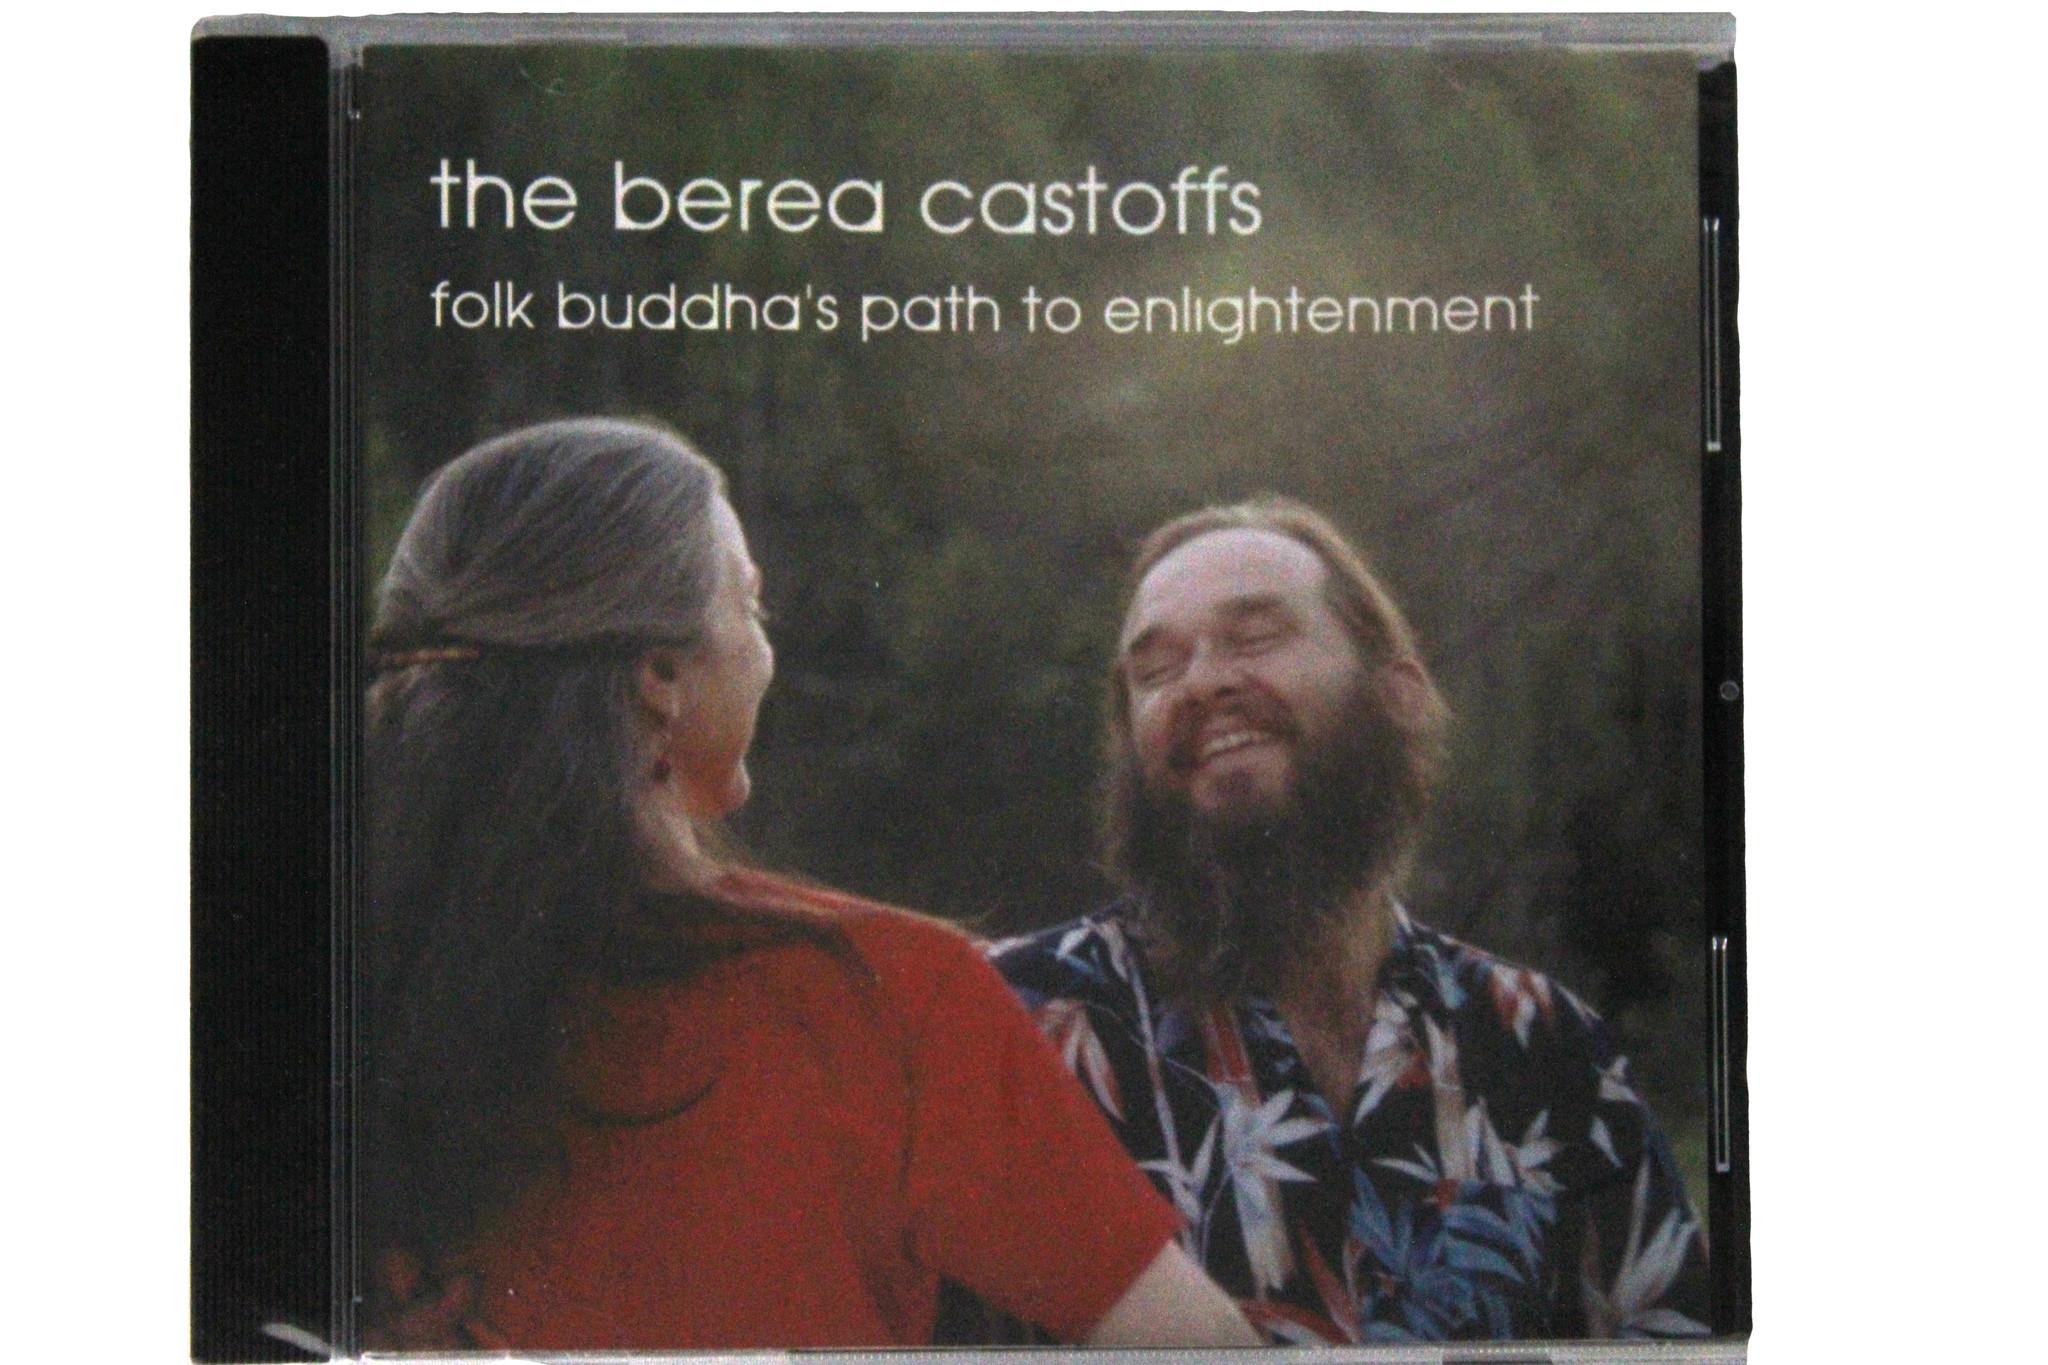 The Berea Castoffs: Folk Buddha's Path to Enlightenment-1